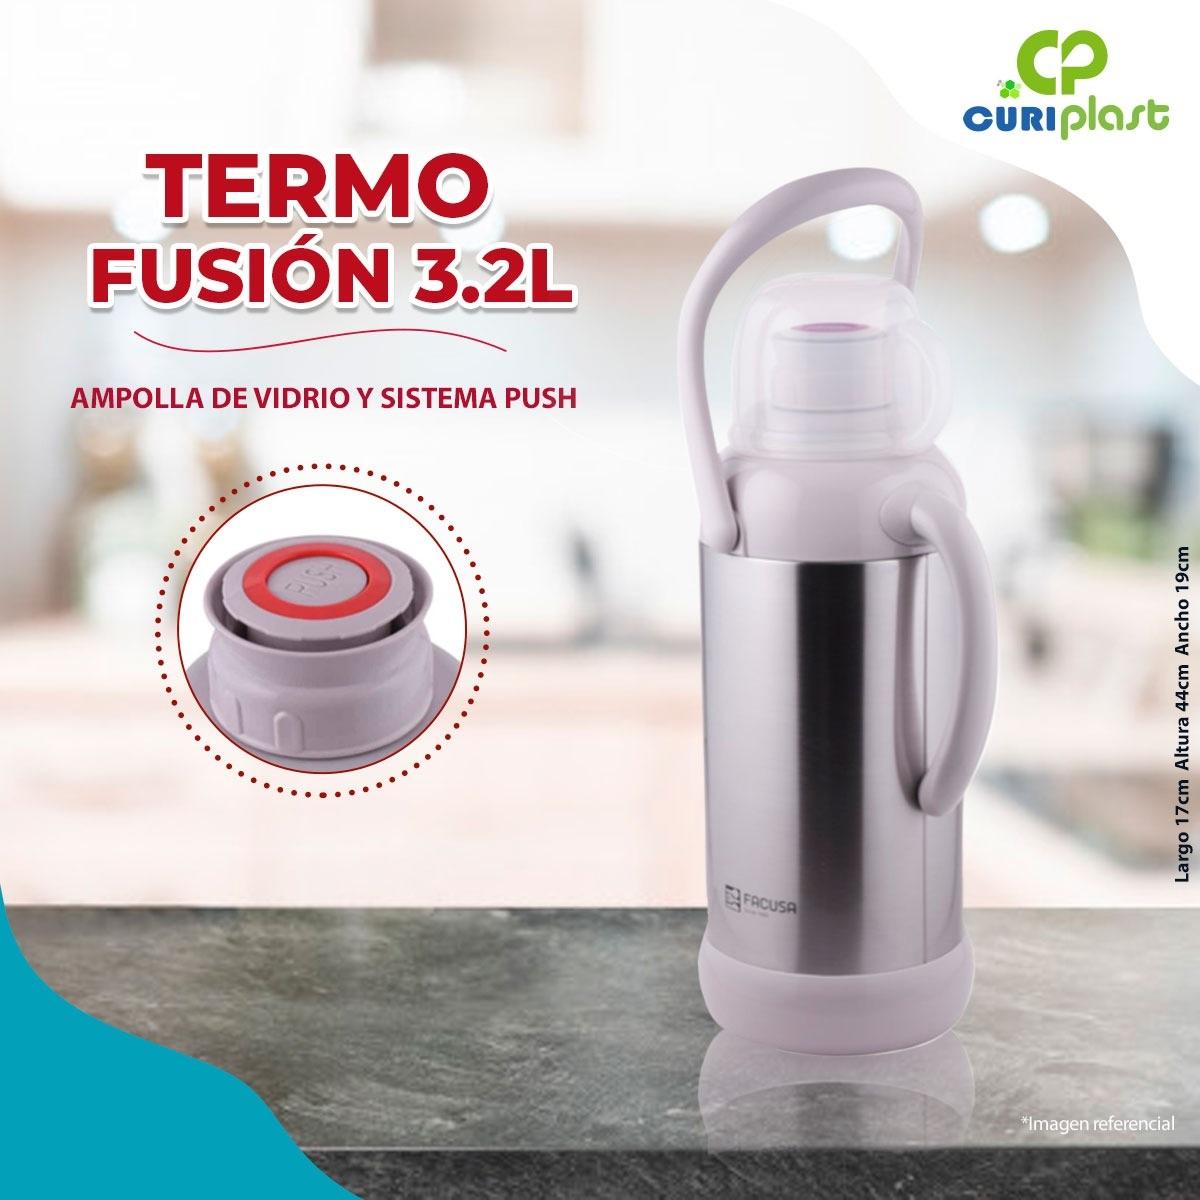 Termo fusión 3.2L